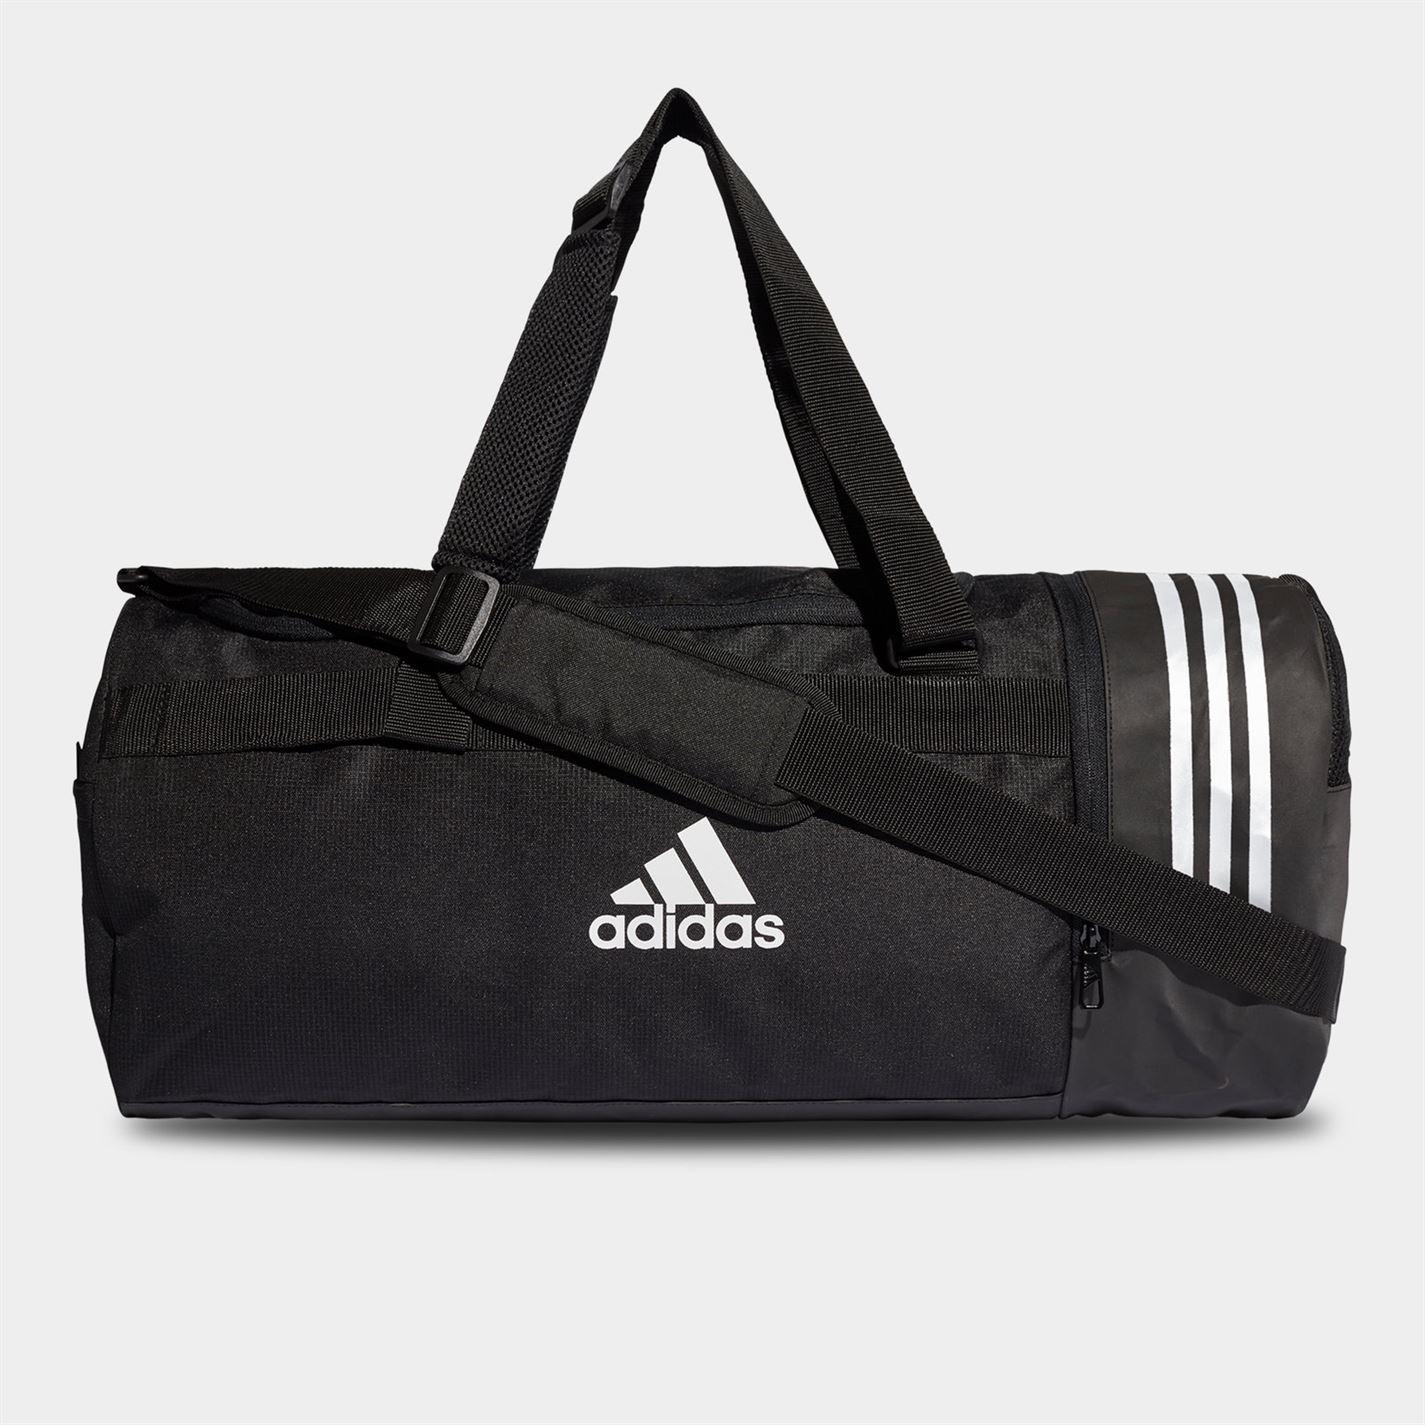 Adidas TRAIN TEAMBAG M 84